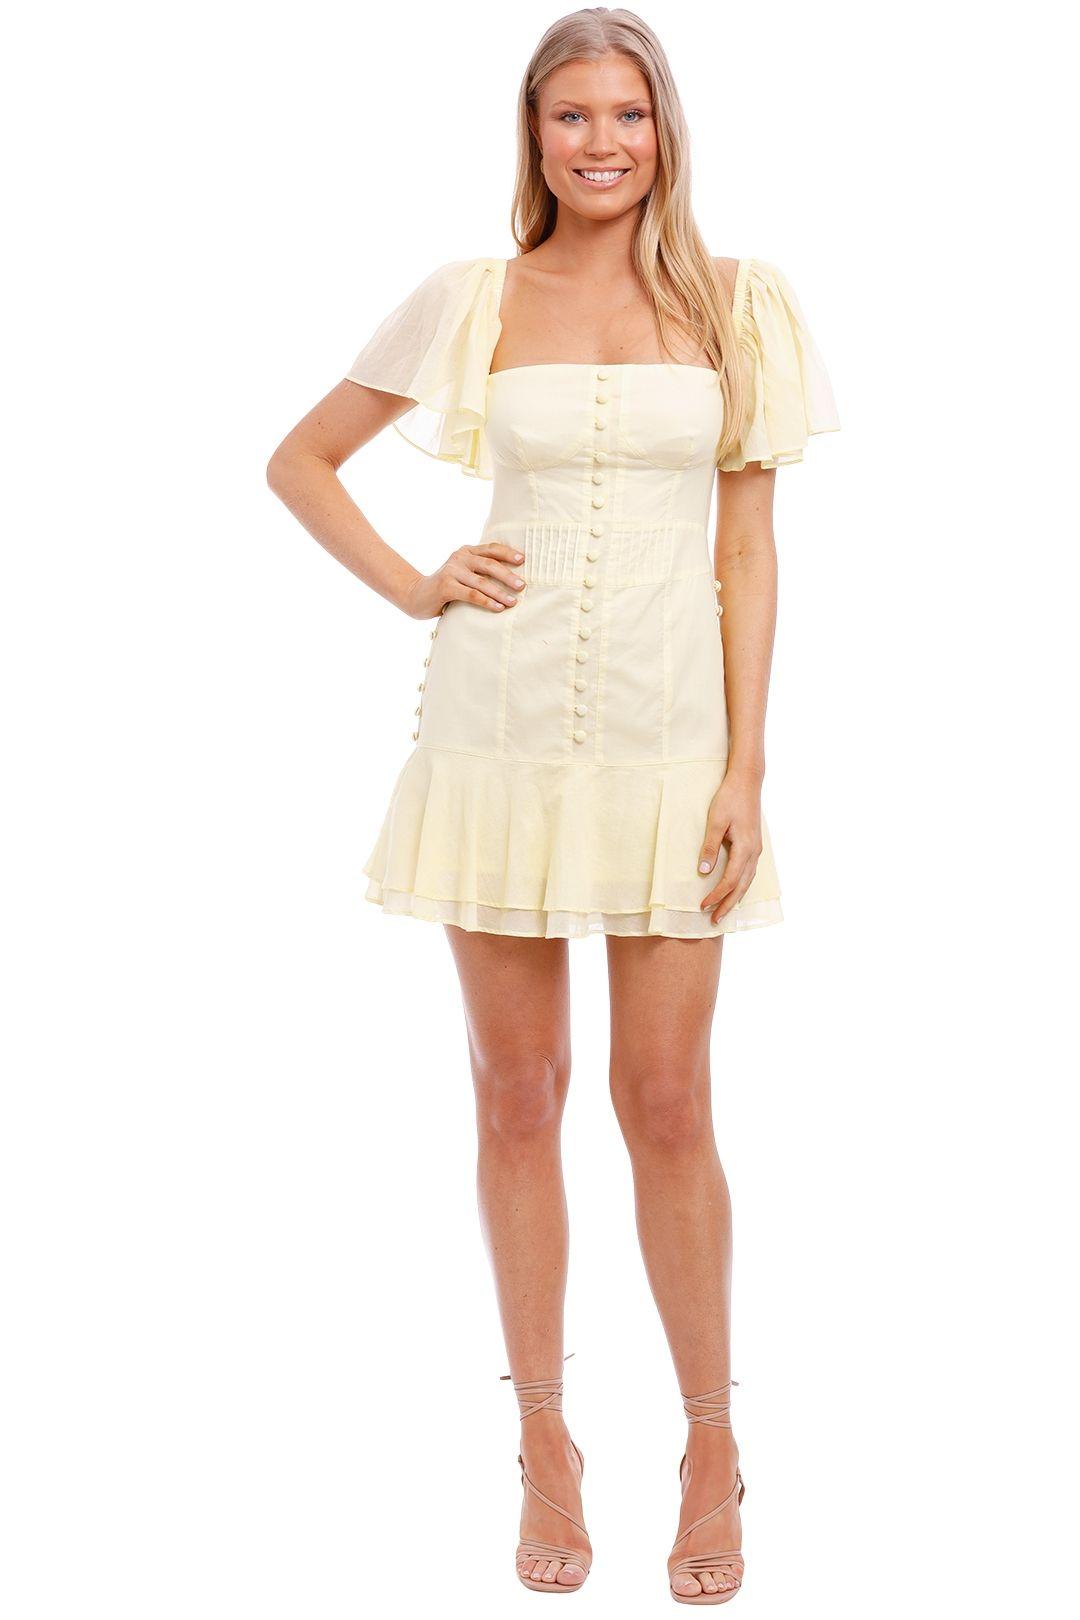 Joslin Frances Cotton Dress mini